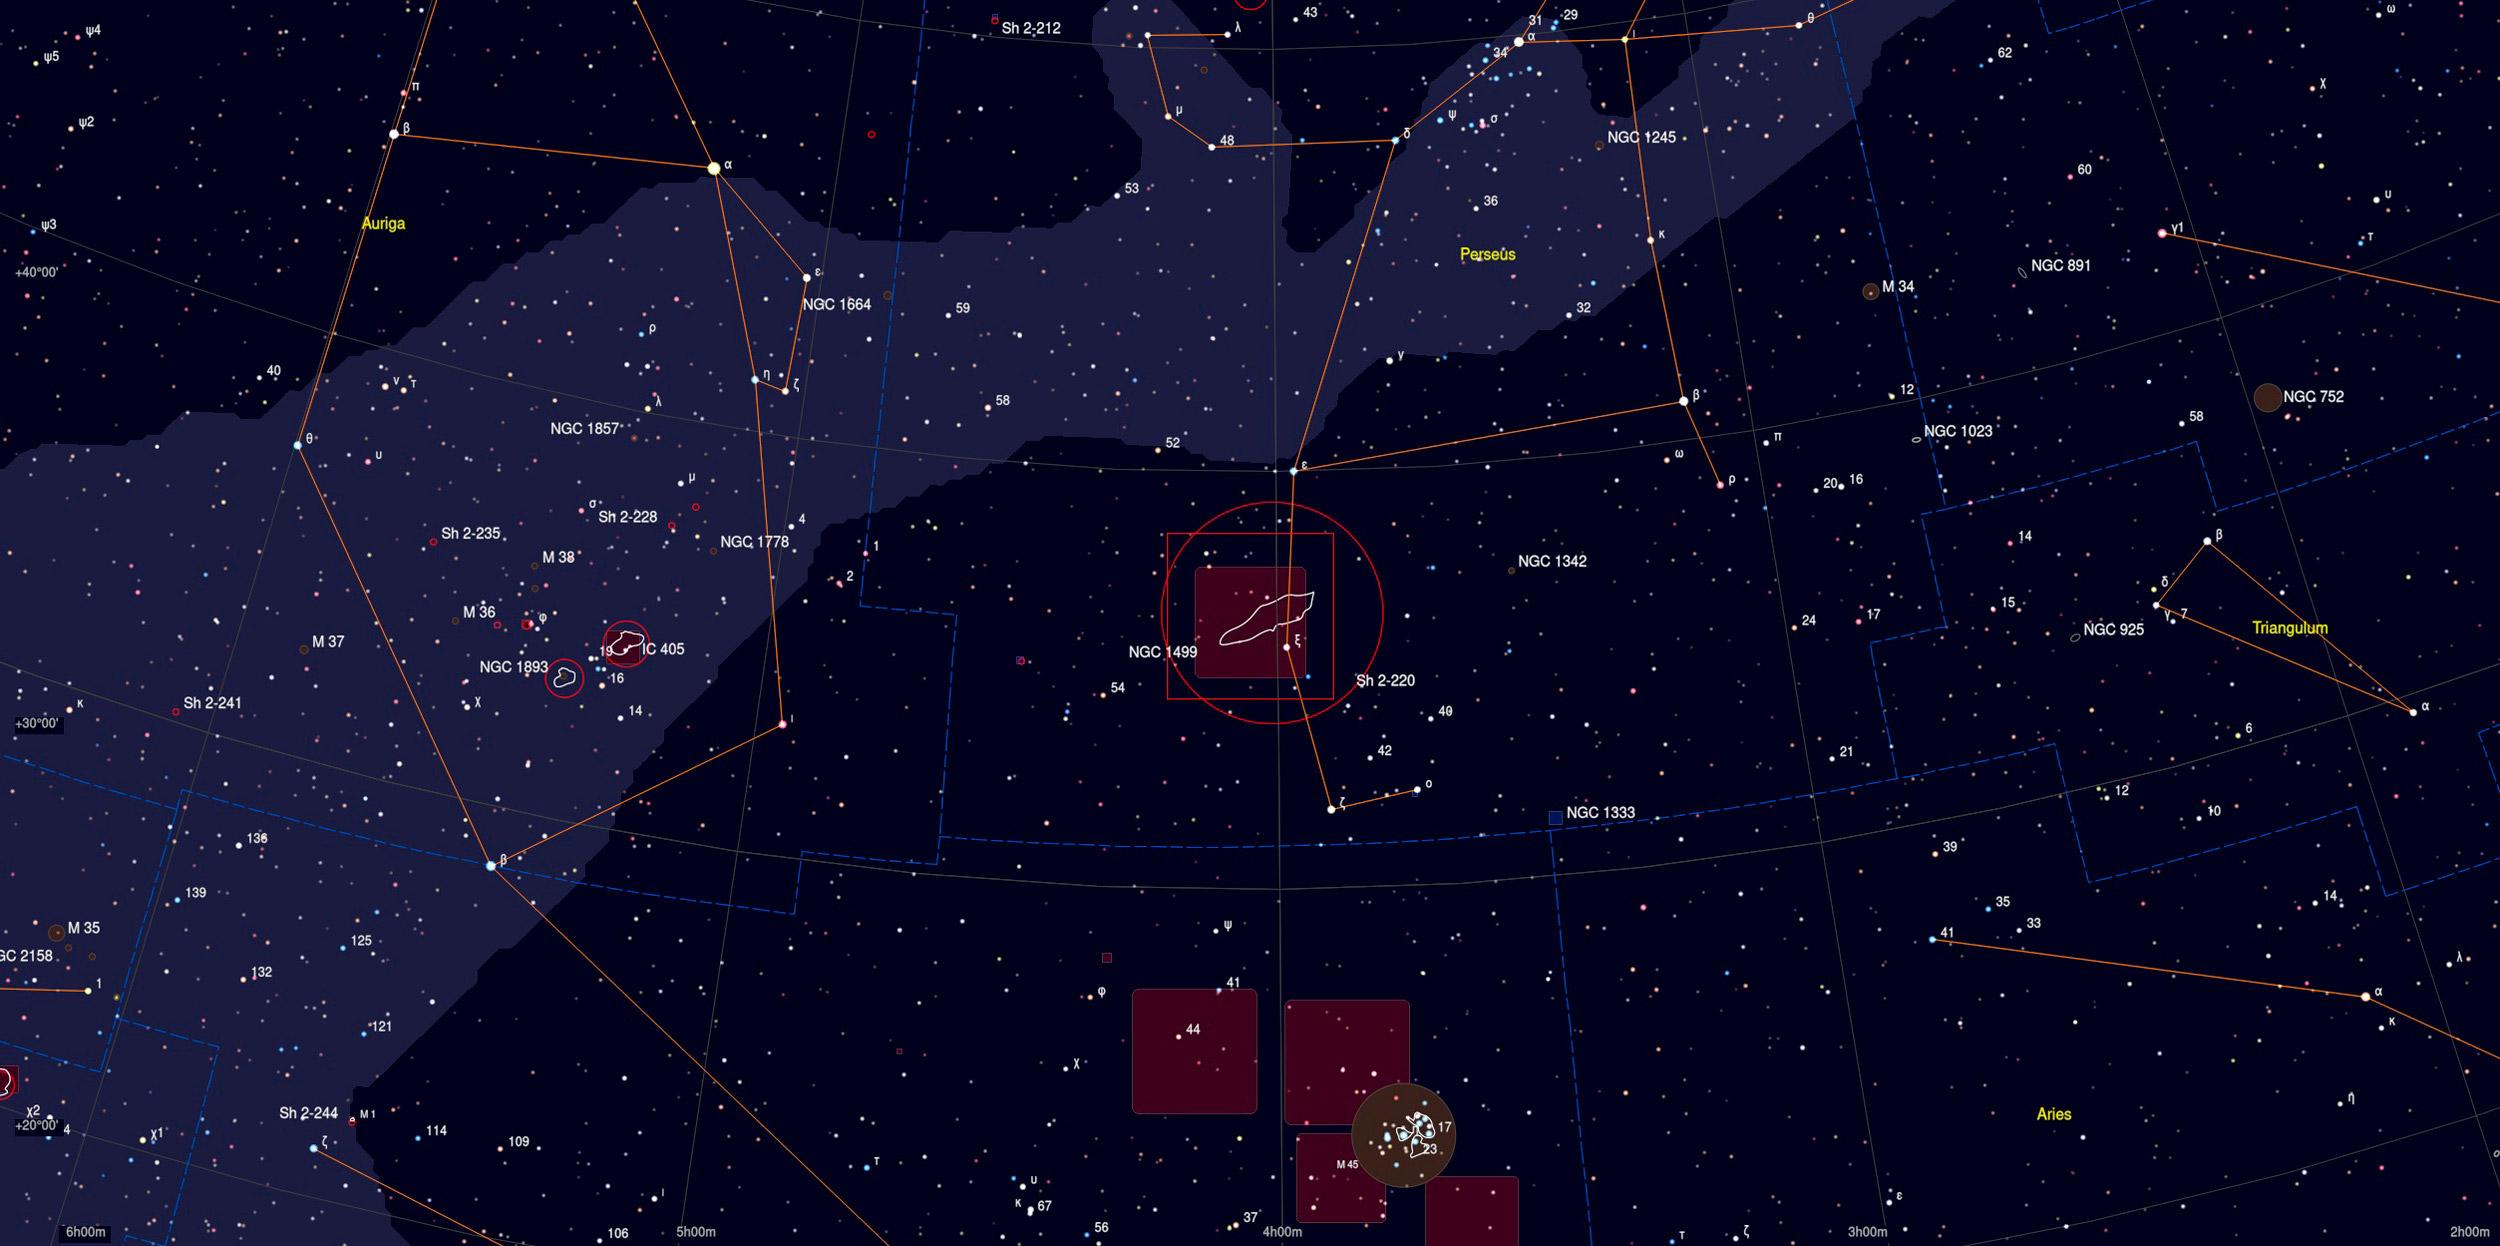 California Nebula (NGC 1499) Sky Chart - Astrophotography Martin Rusterholz